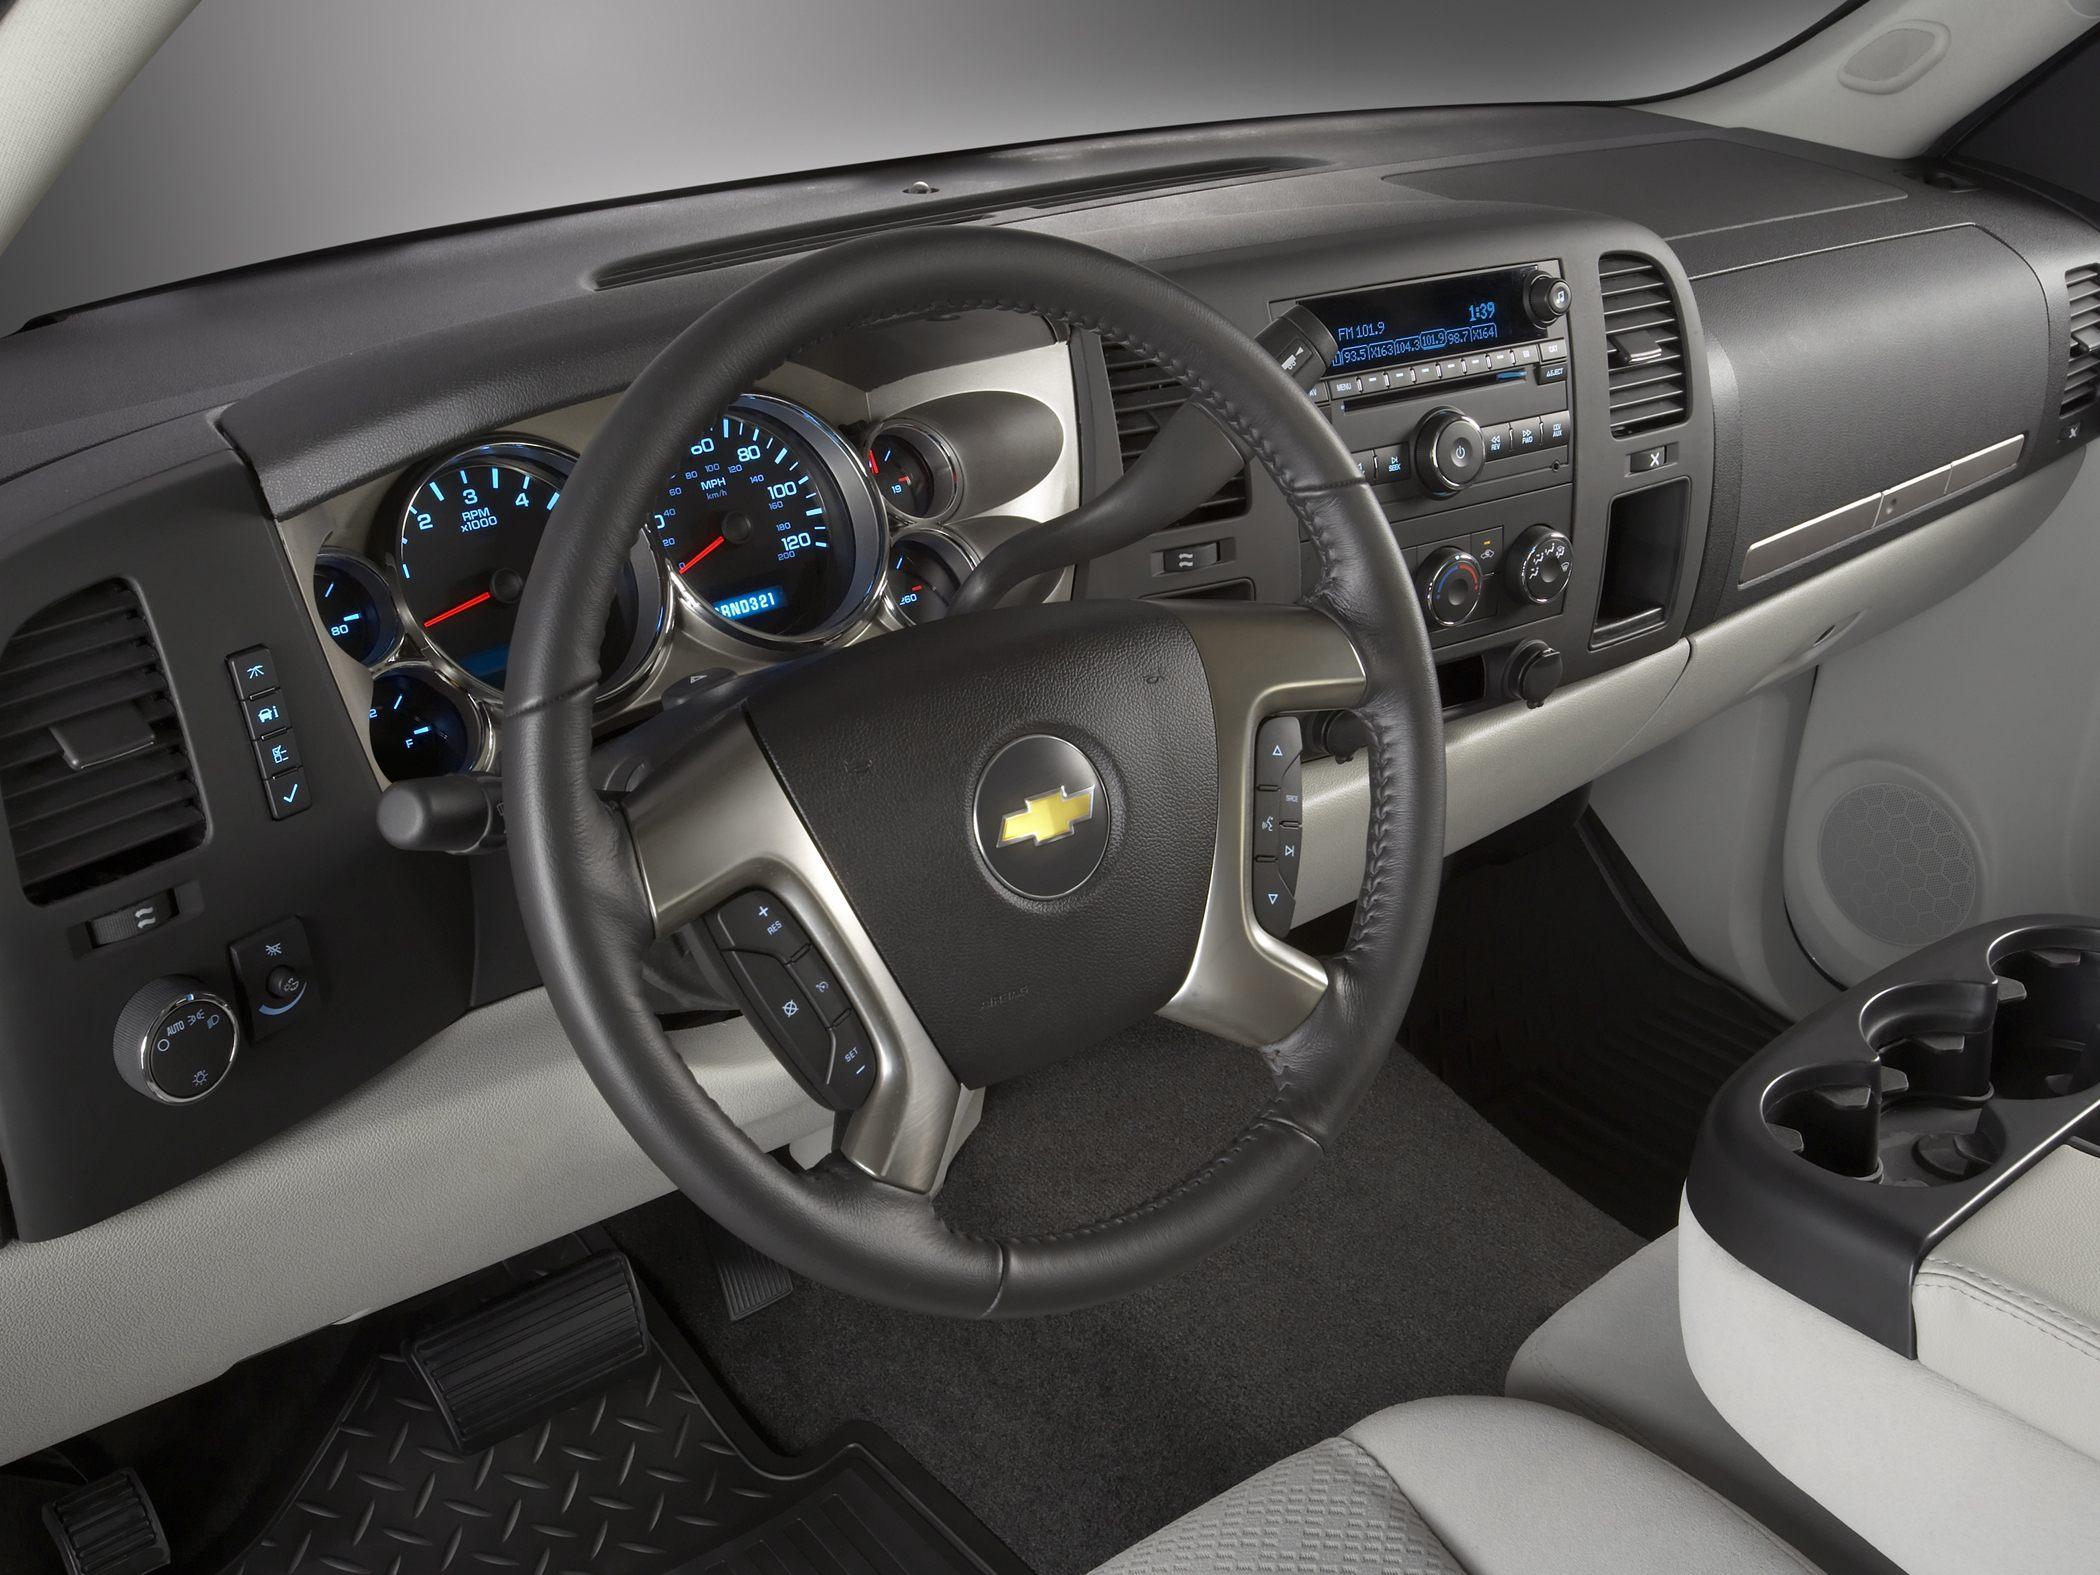 Chevrolet silverado review and photos for Chevrolet interieur